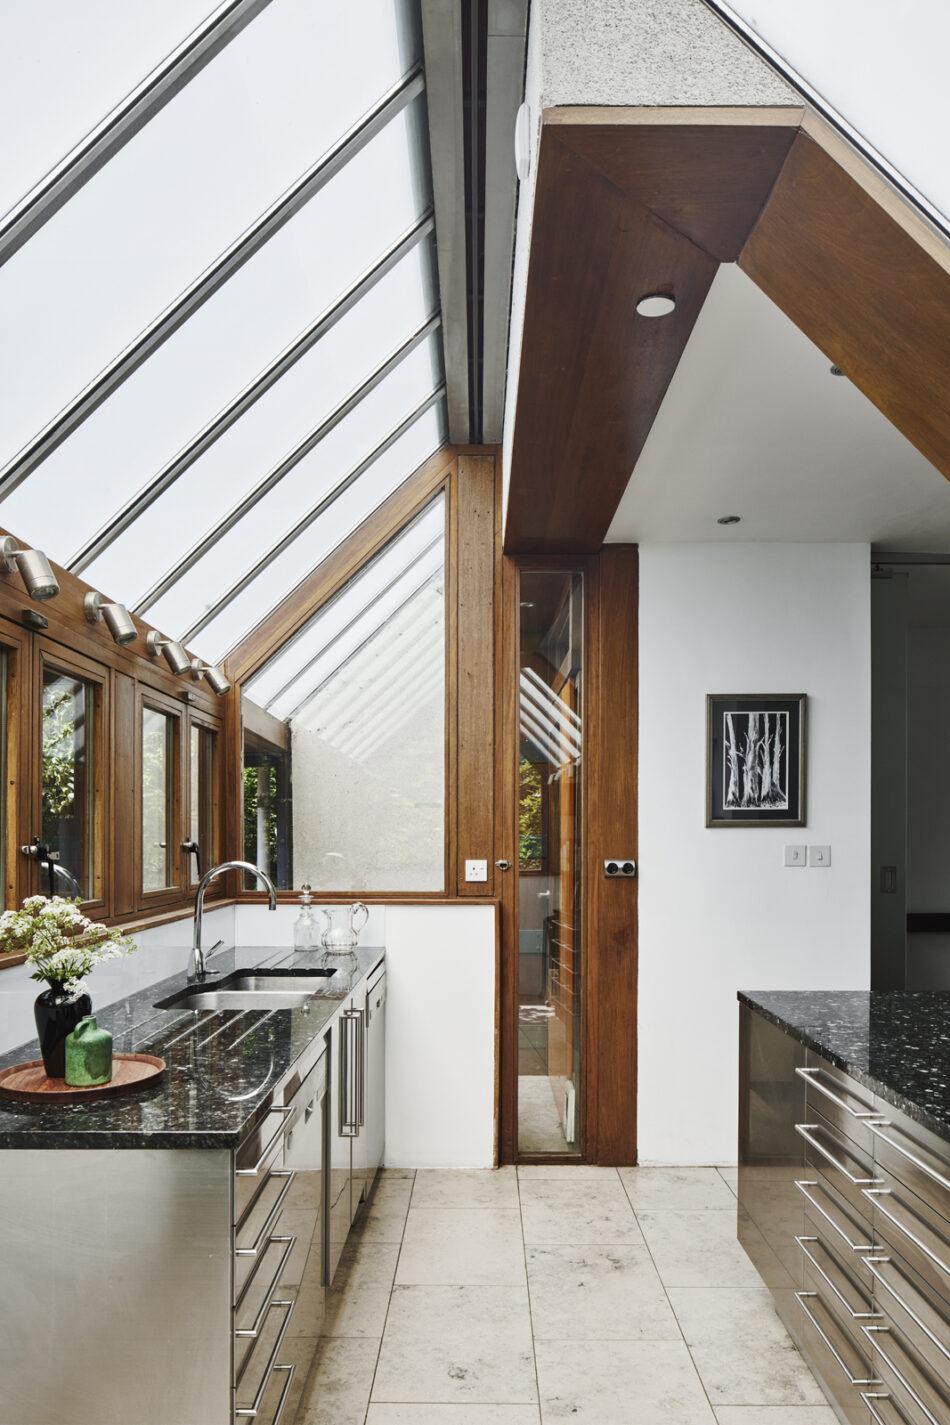 Apex-Lodge-Fitzroy-Park-London-N6-7-950x1425.jpg